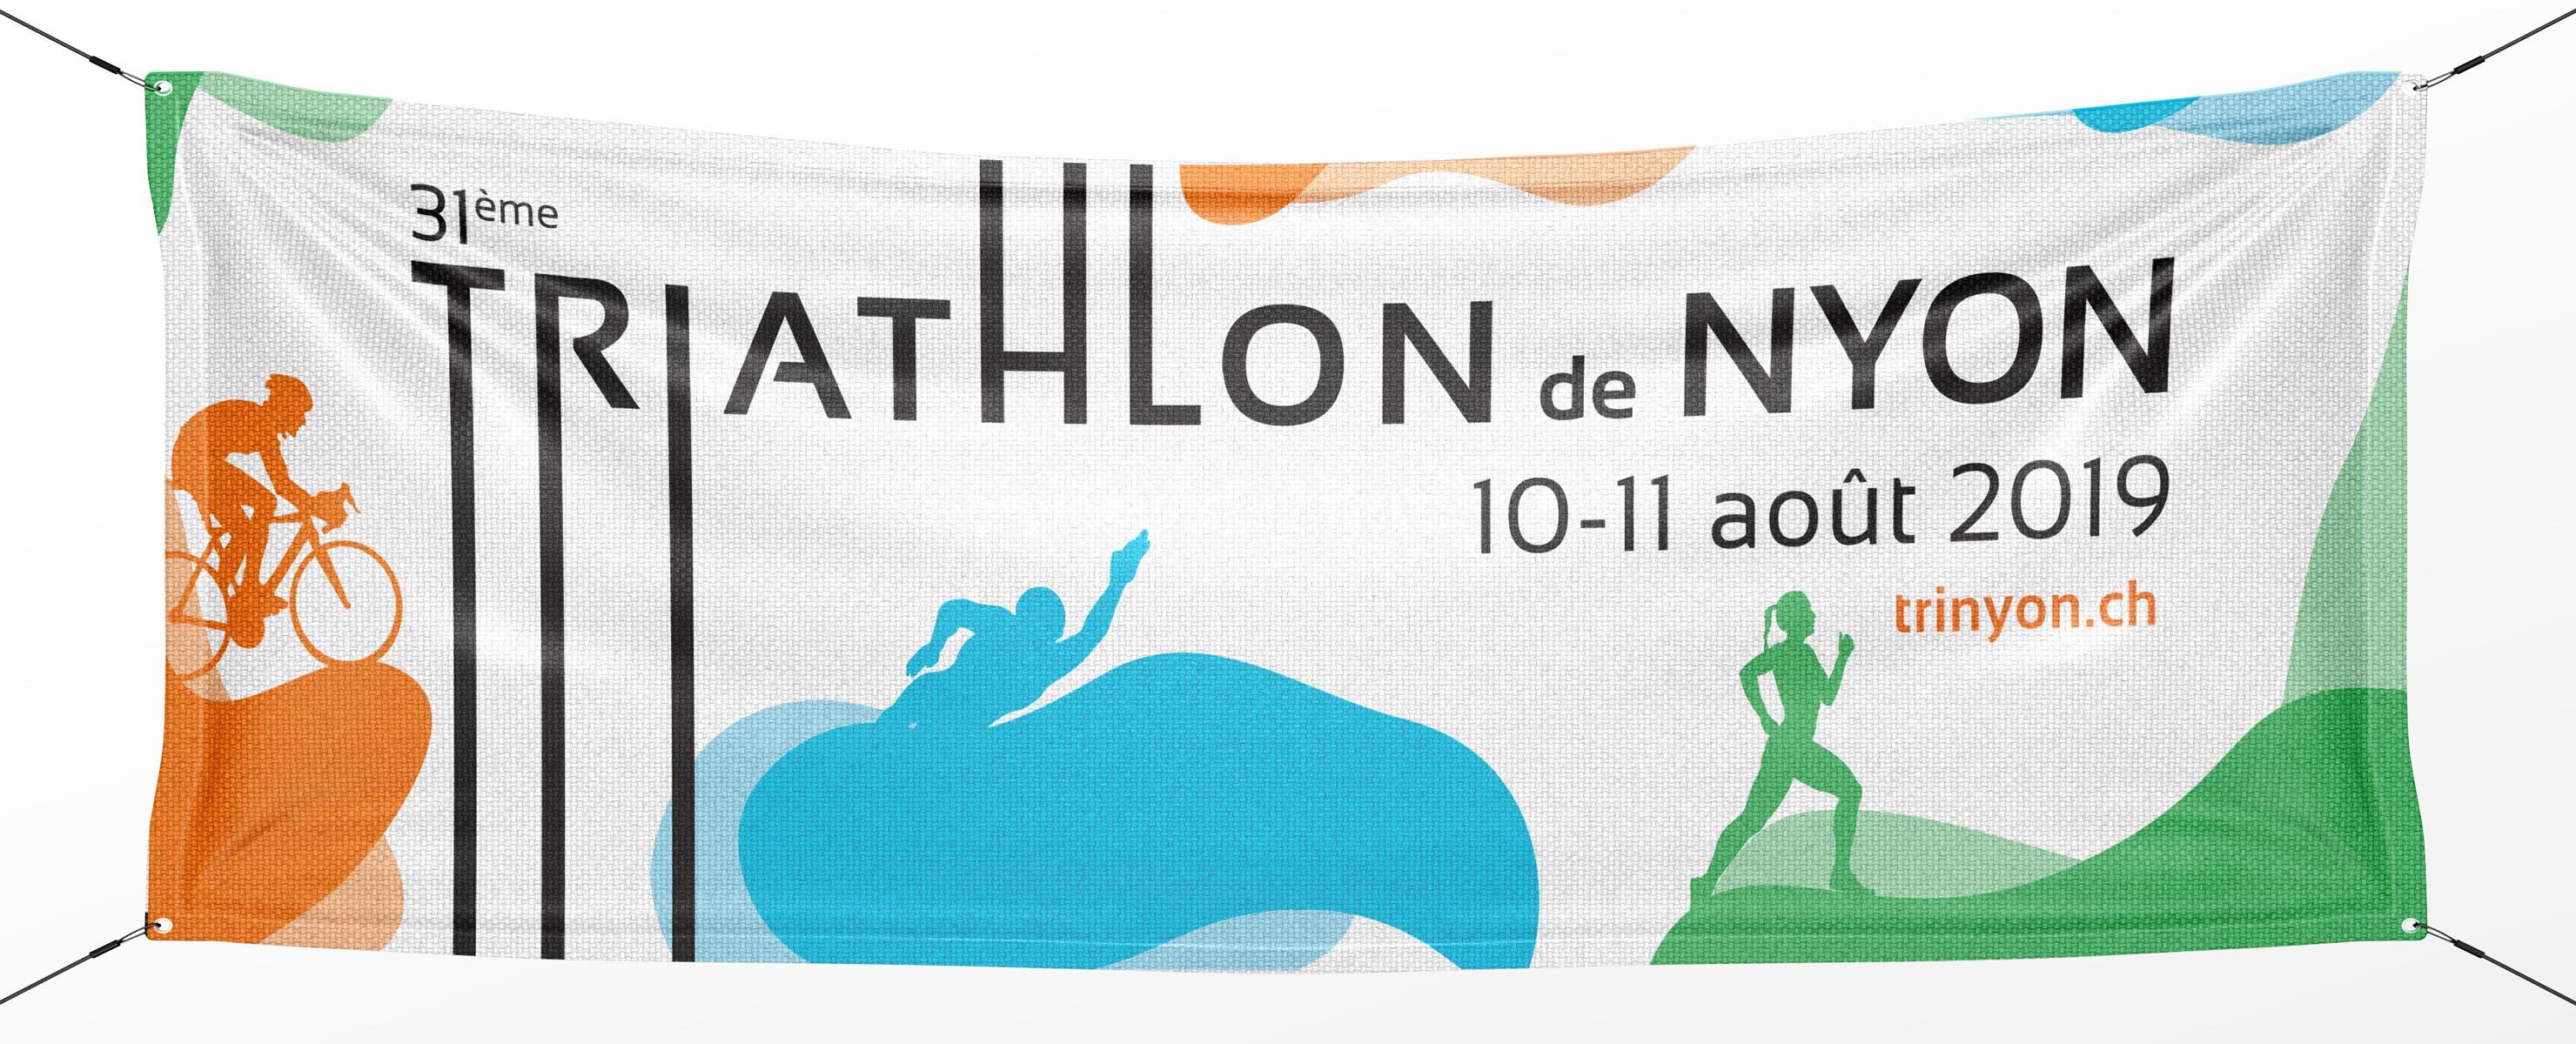 Habefast Etude De Cas Triathlon Nyon Print Bandeau Full